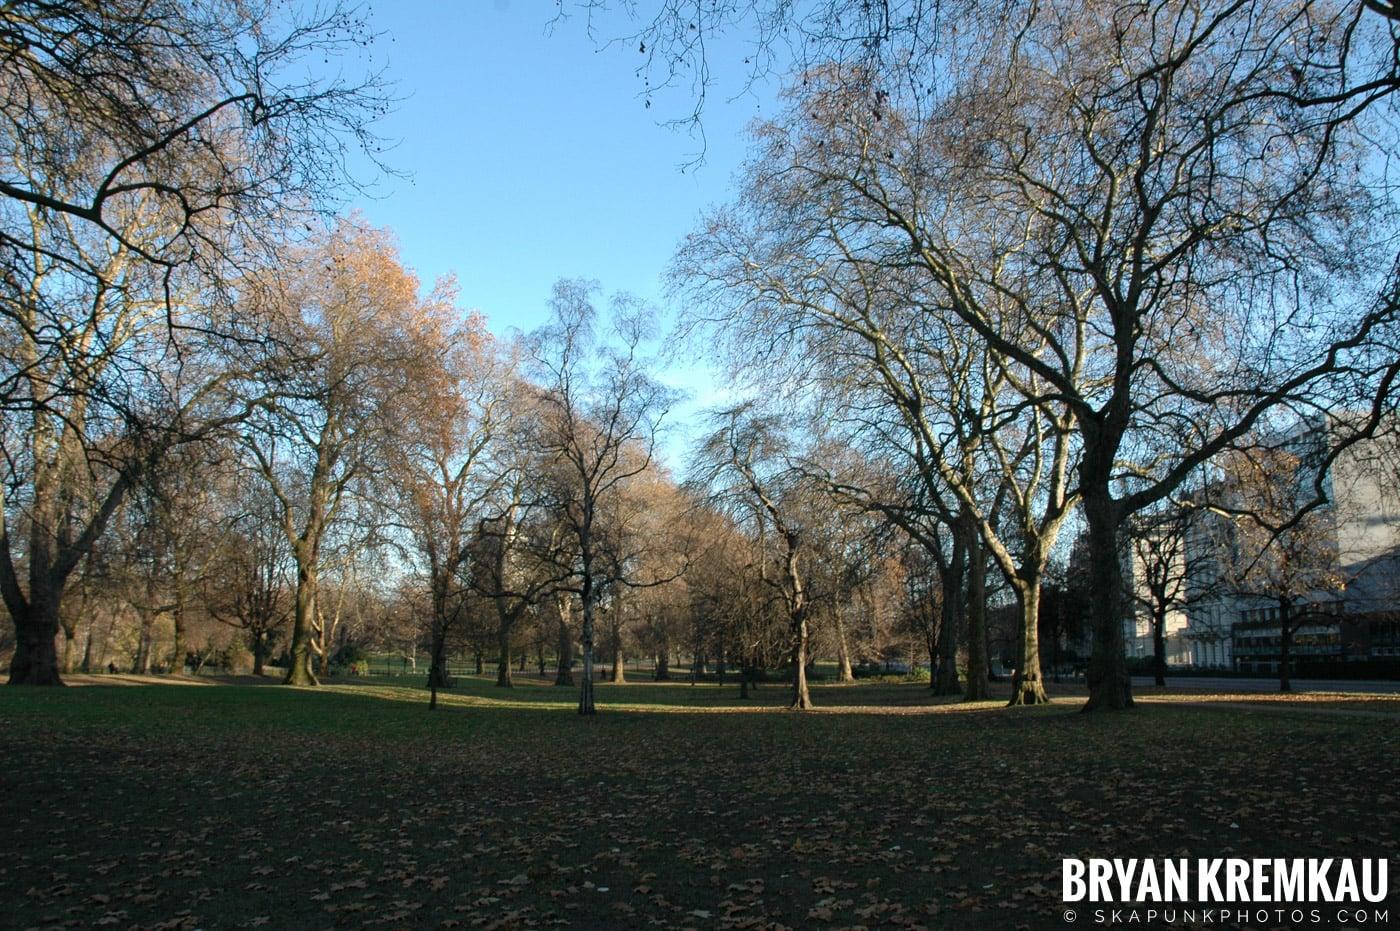 London, England - Day 3 - 12.18.05 (35)